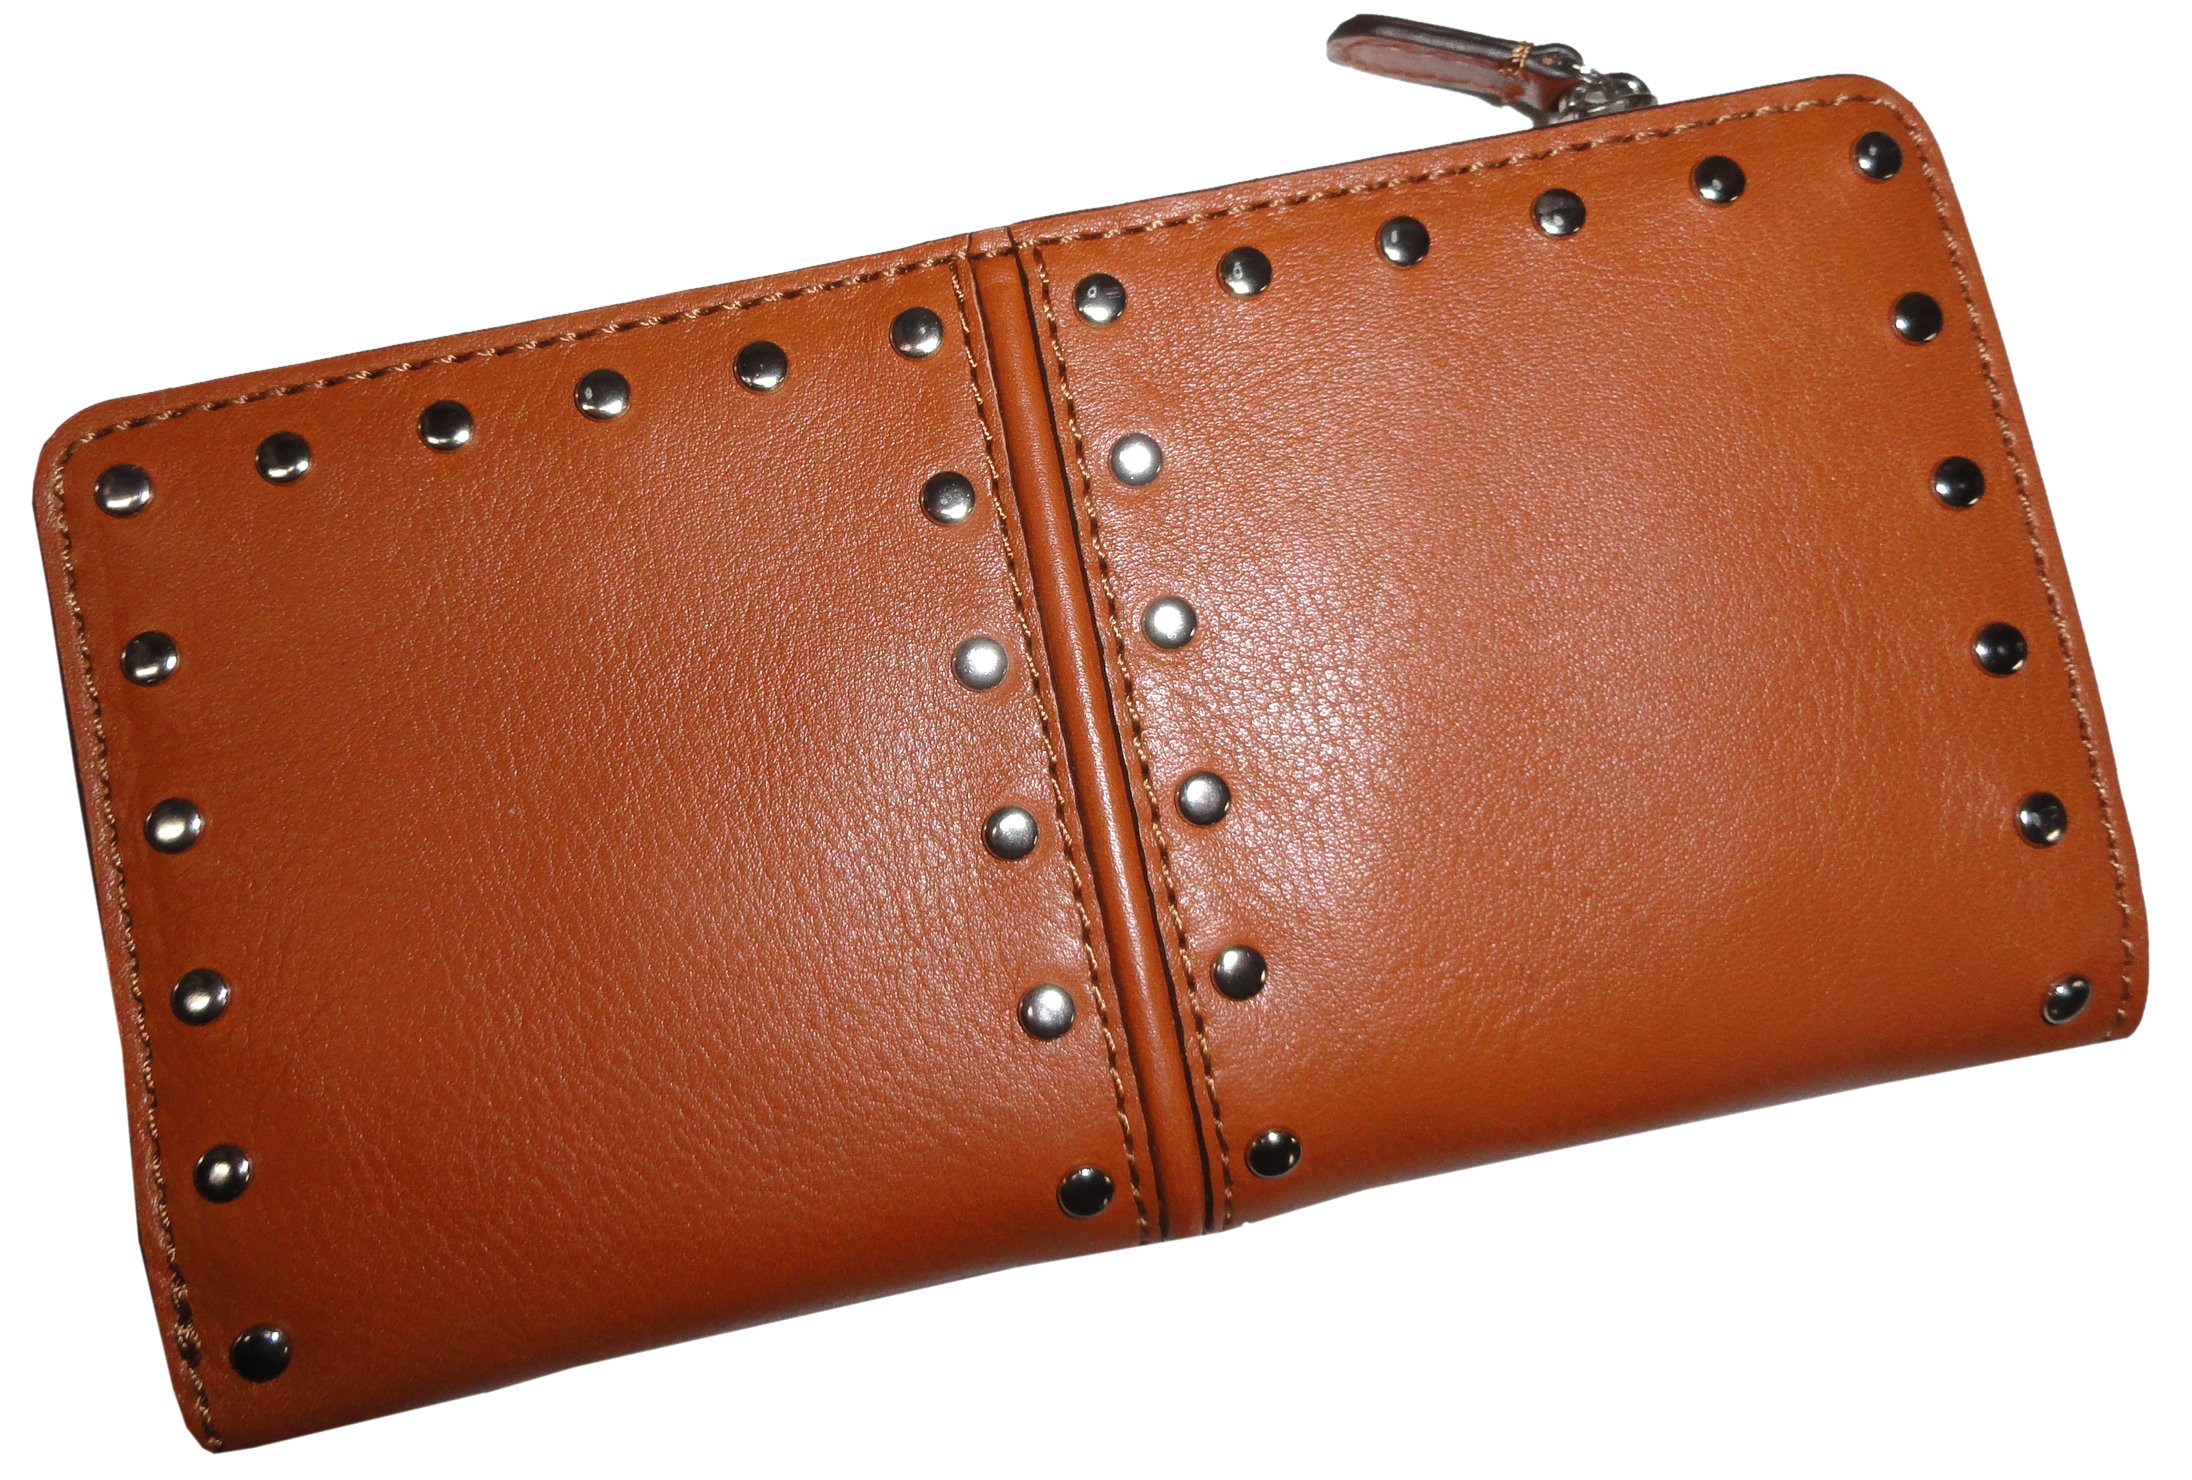 Michael Kors Astor Top Zip Continental Luggage Brown Leather Wallet